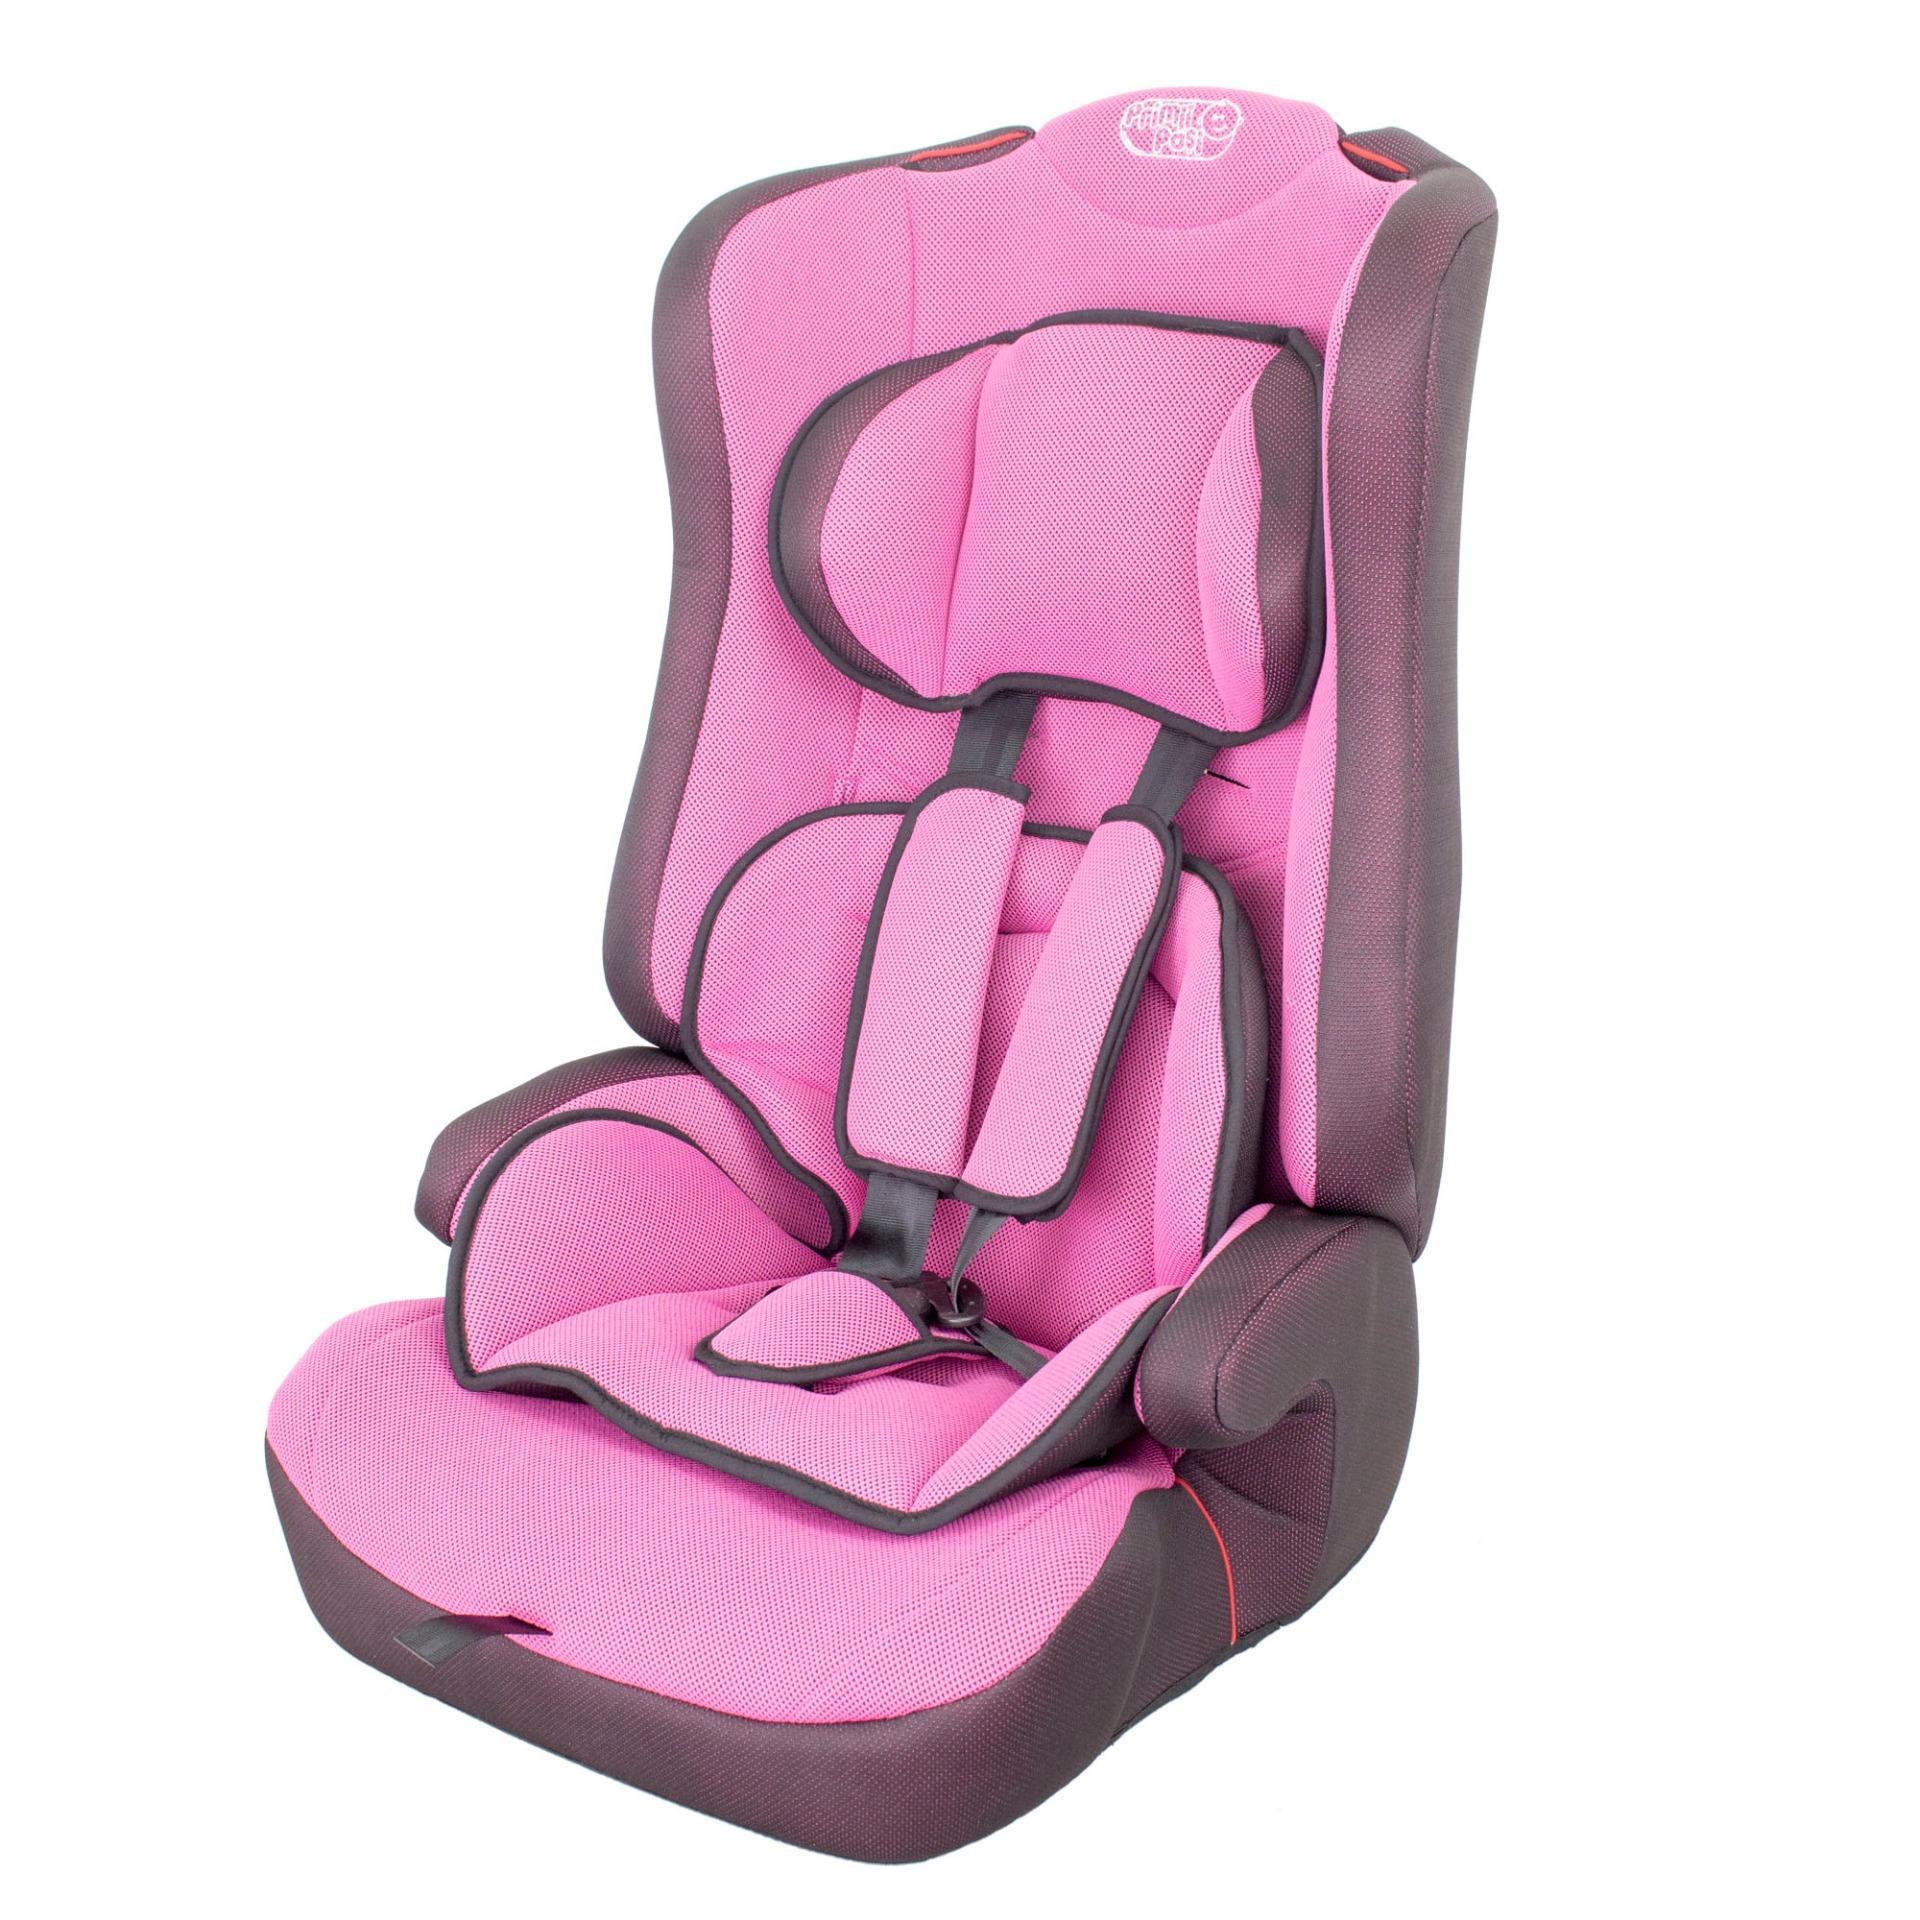 Rocking crib for sale philippines - Phoenixhub Elegant Designed Baby Car Seat Basket Carrier Primii Pasi Pink